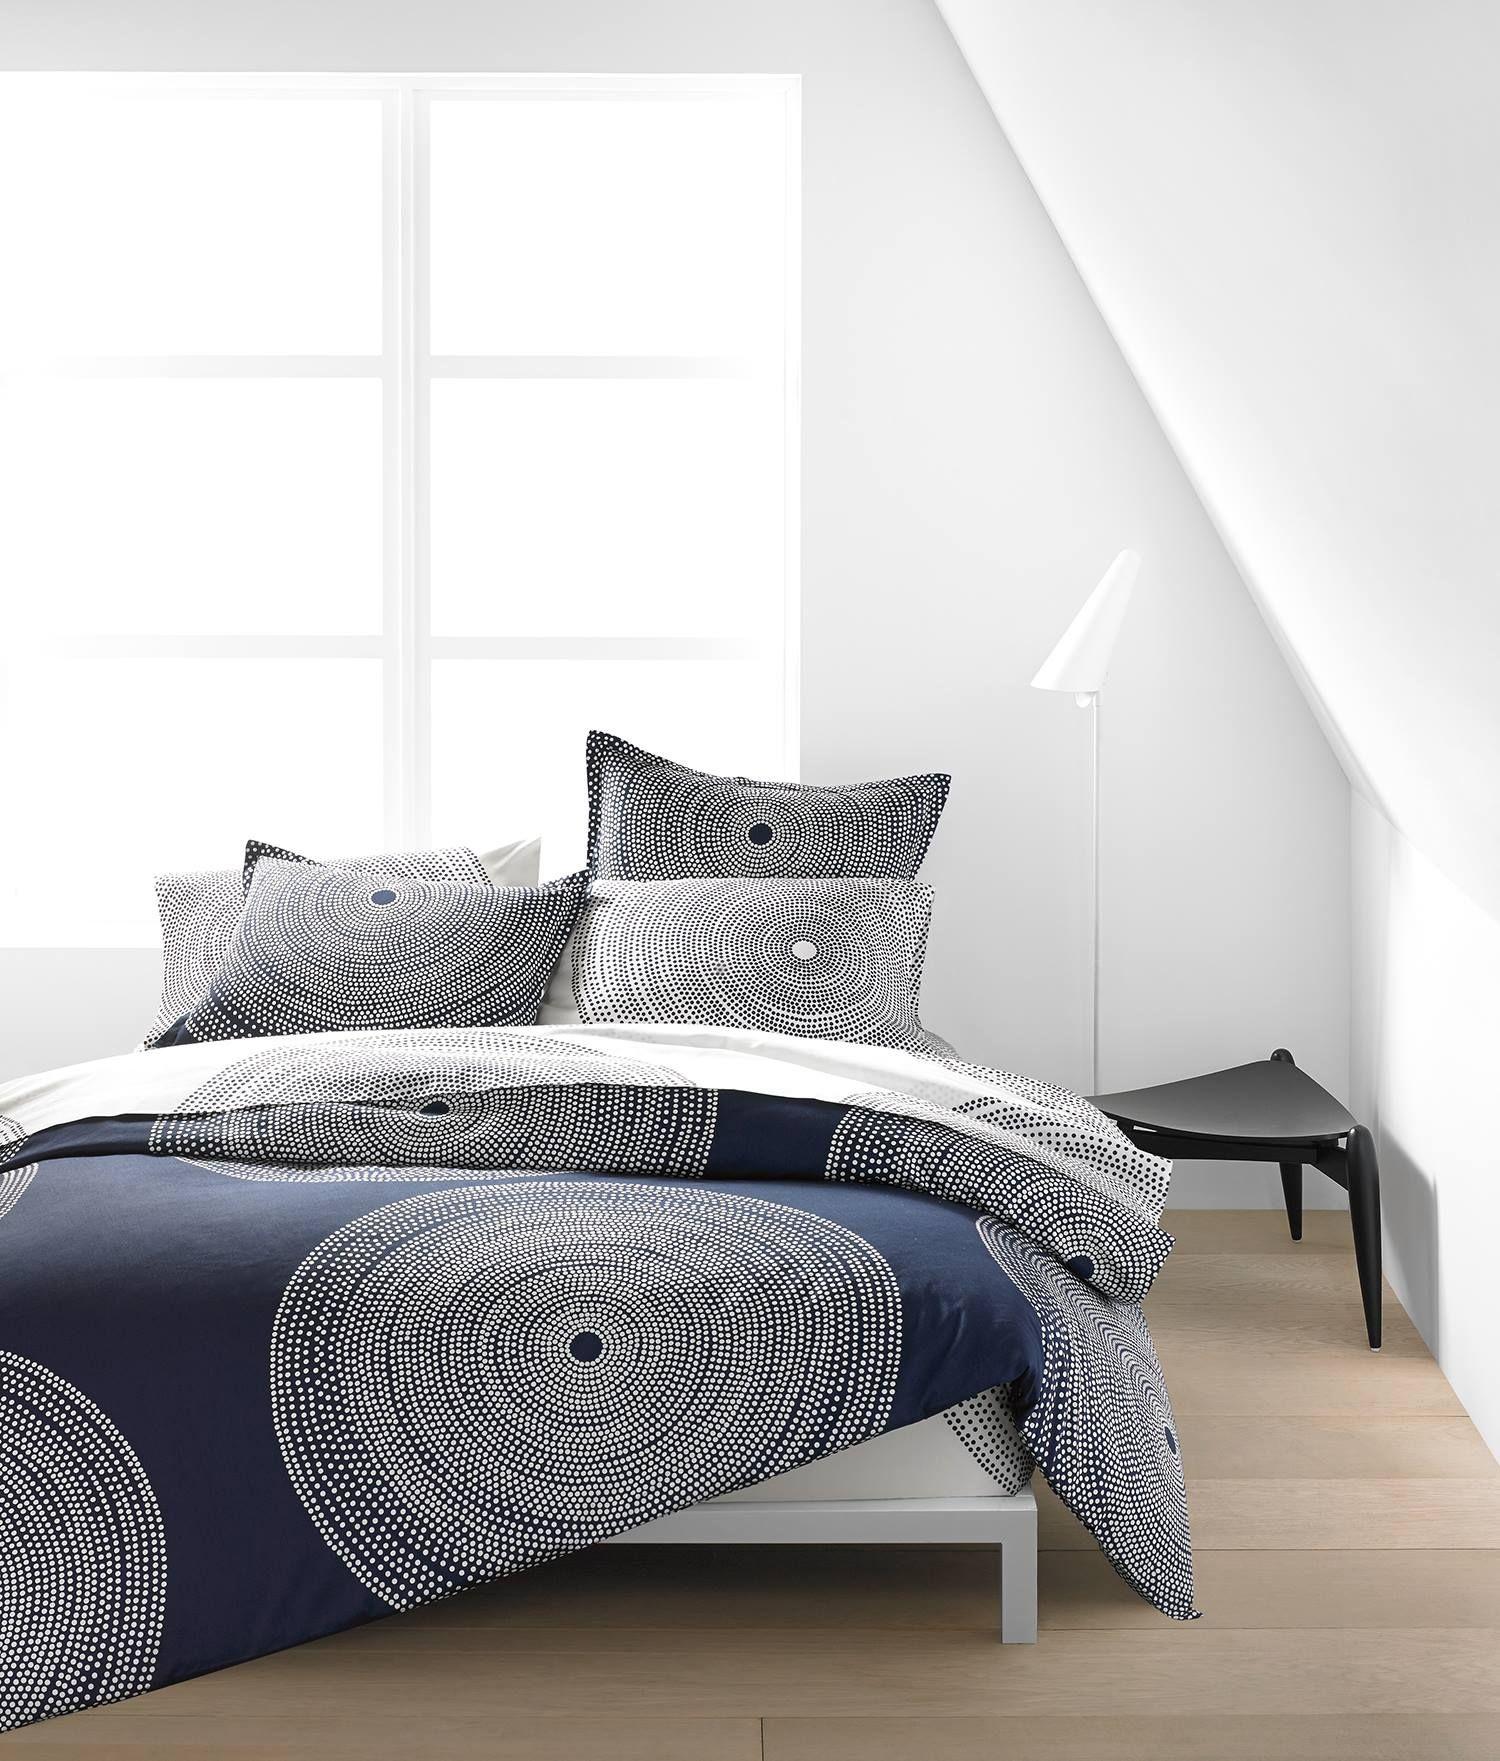 Fokus Bedding Marimekko Marimekko Bedding Duvet Sets Blue Bedding